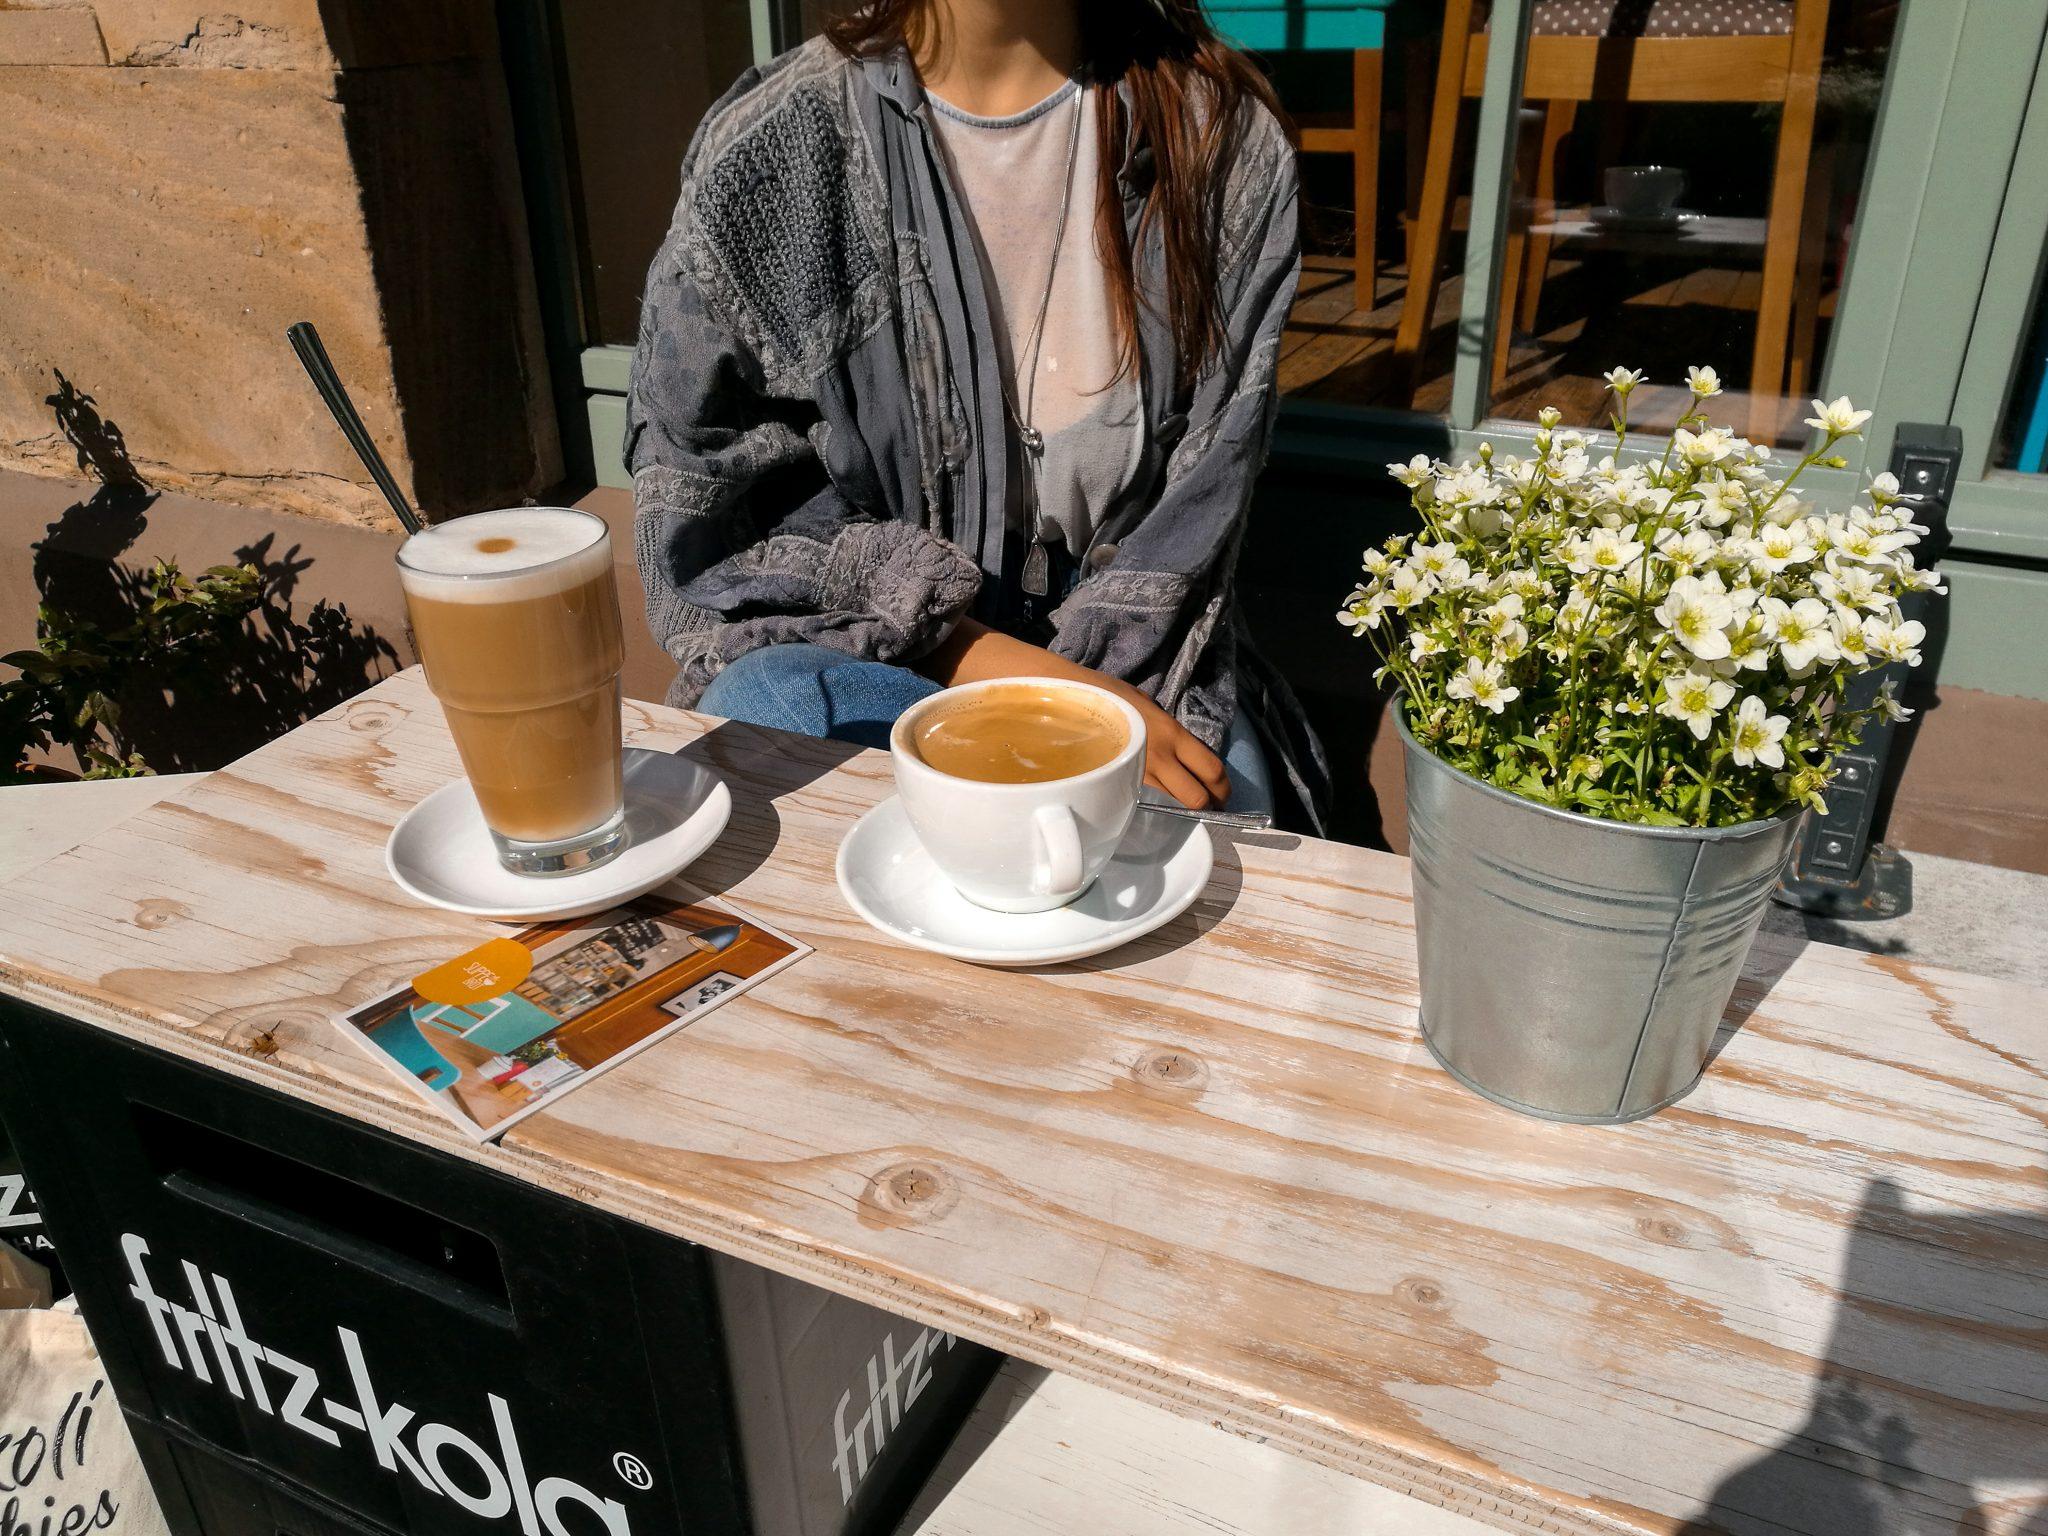 Landau-pfalz-restaurant-suppe-mag-brot-kaffee